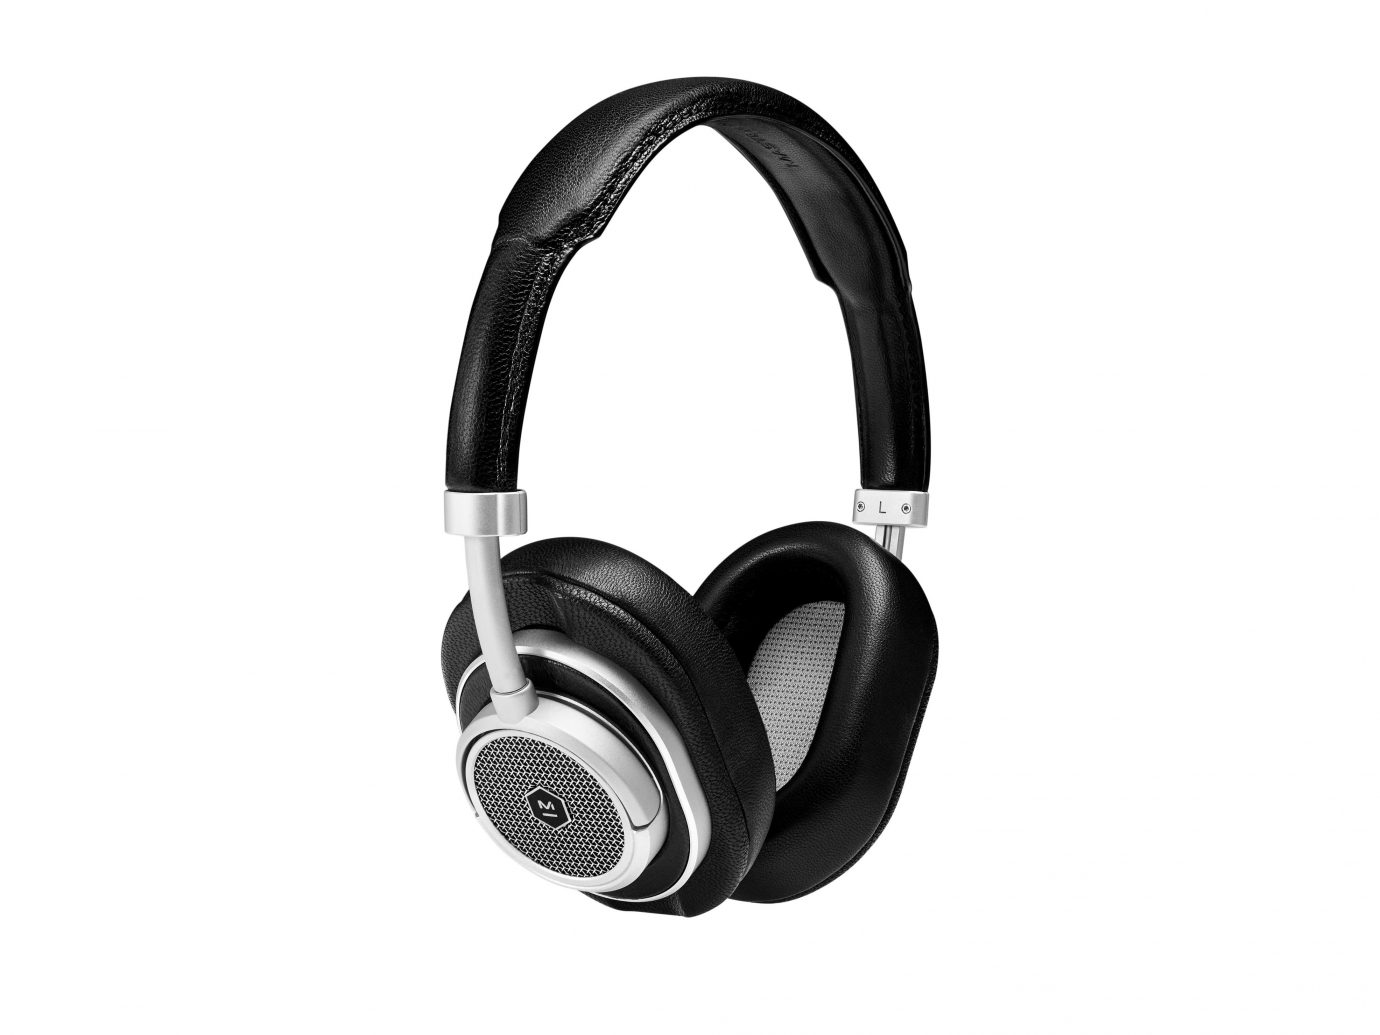 Master & Dynamic On/Over-Ear Headphones